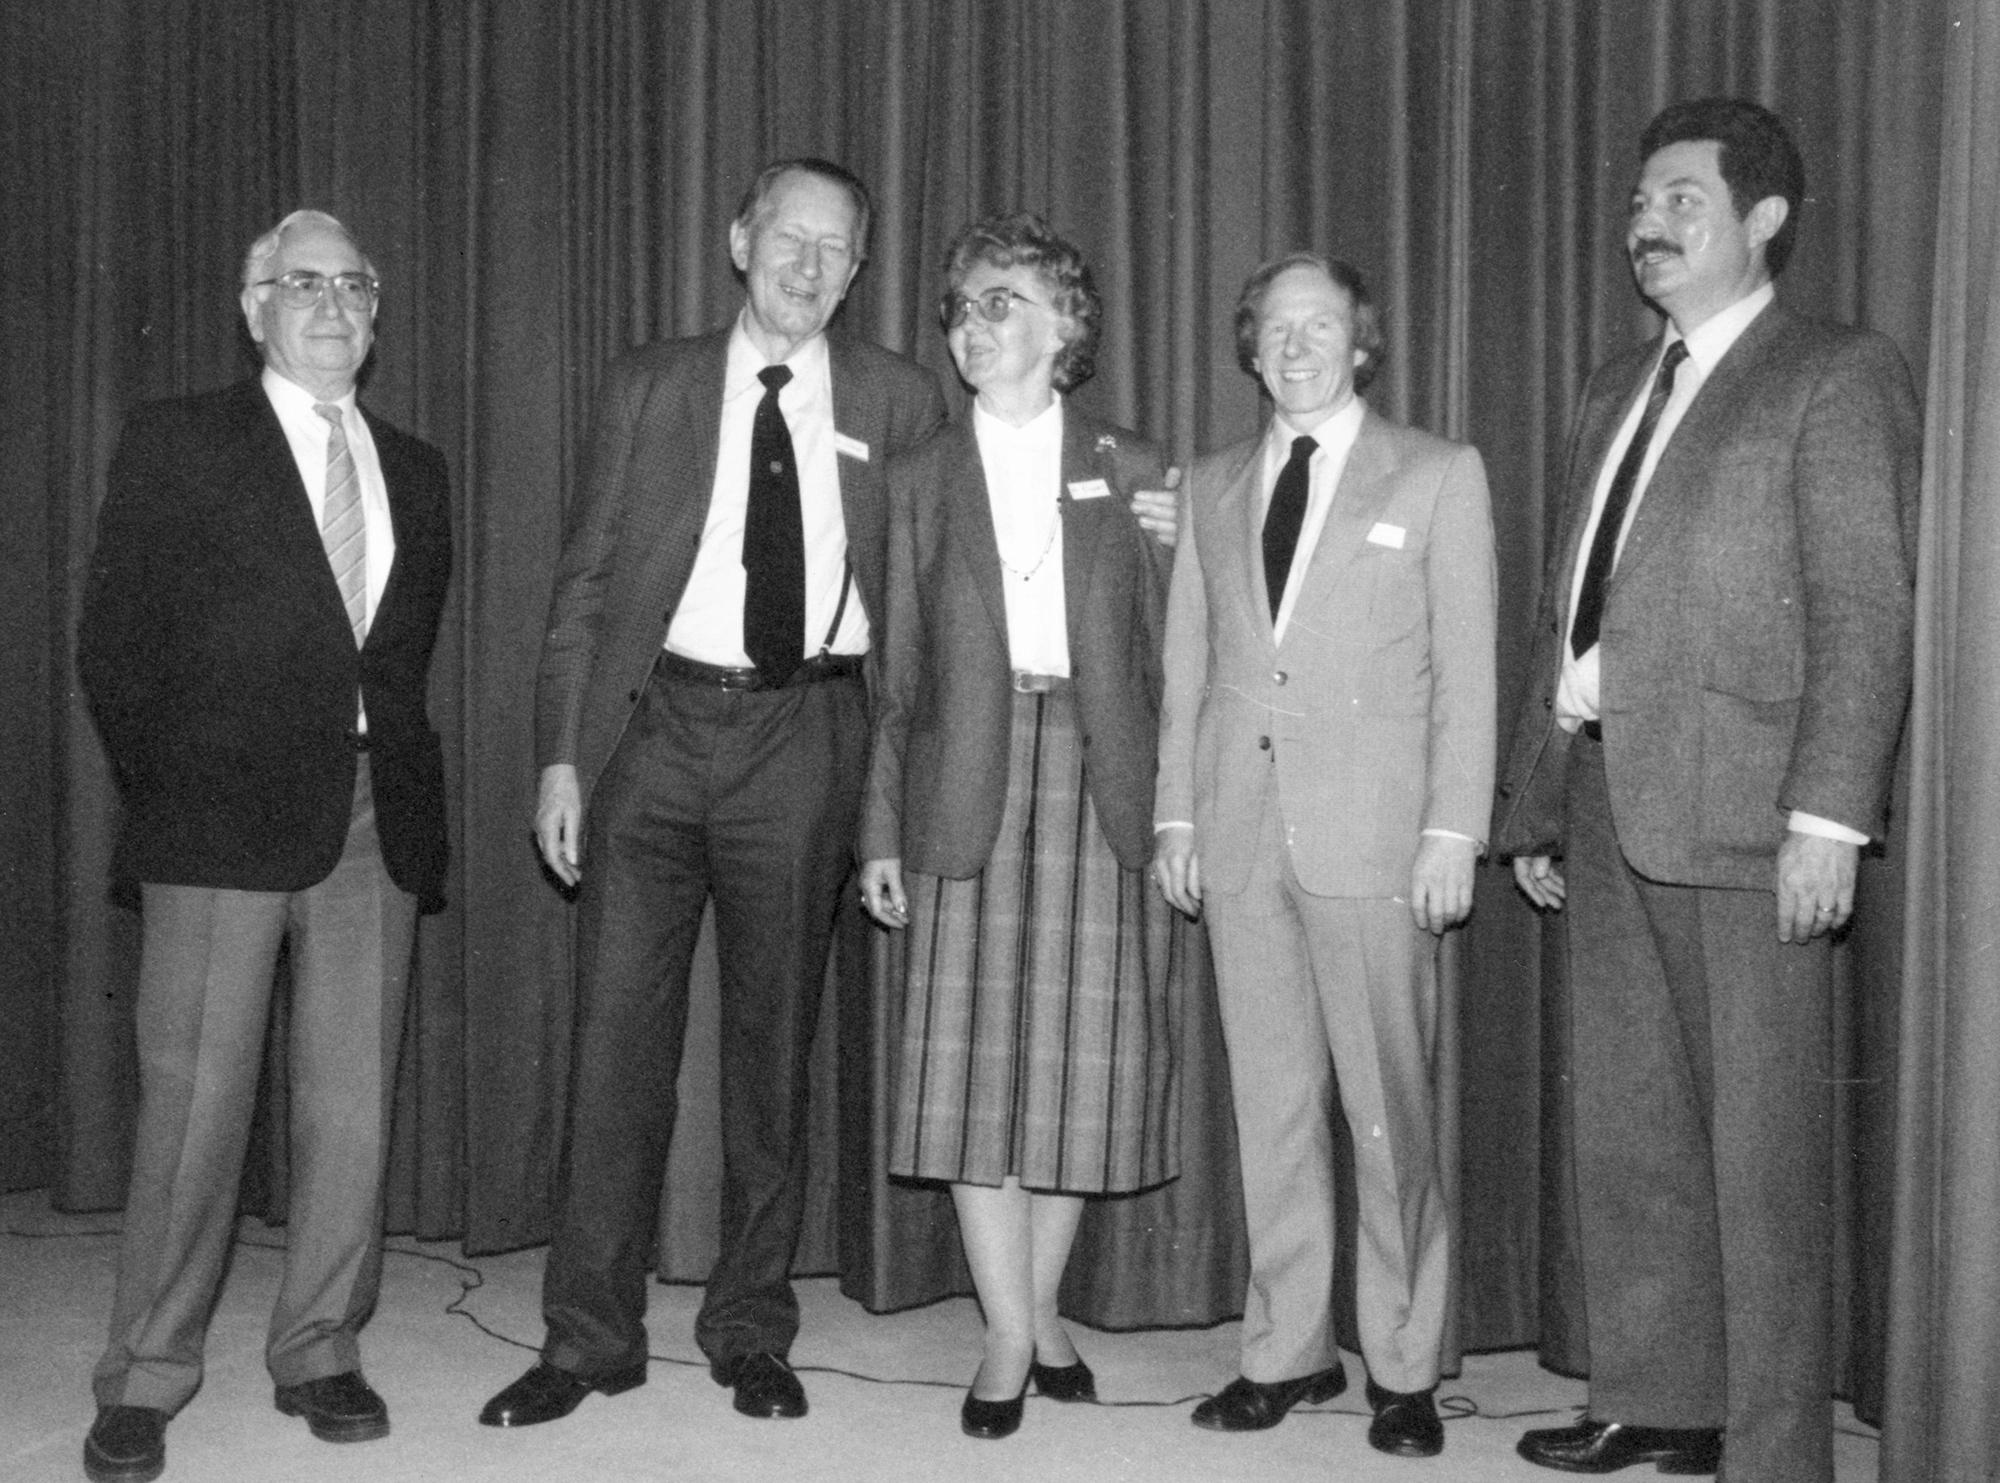 Marianne Englert 1985 in Oldenburg (mit Seeberg Sprenger Englert Gerhard Mantwill Schmitt)